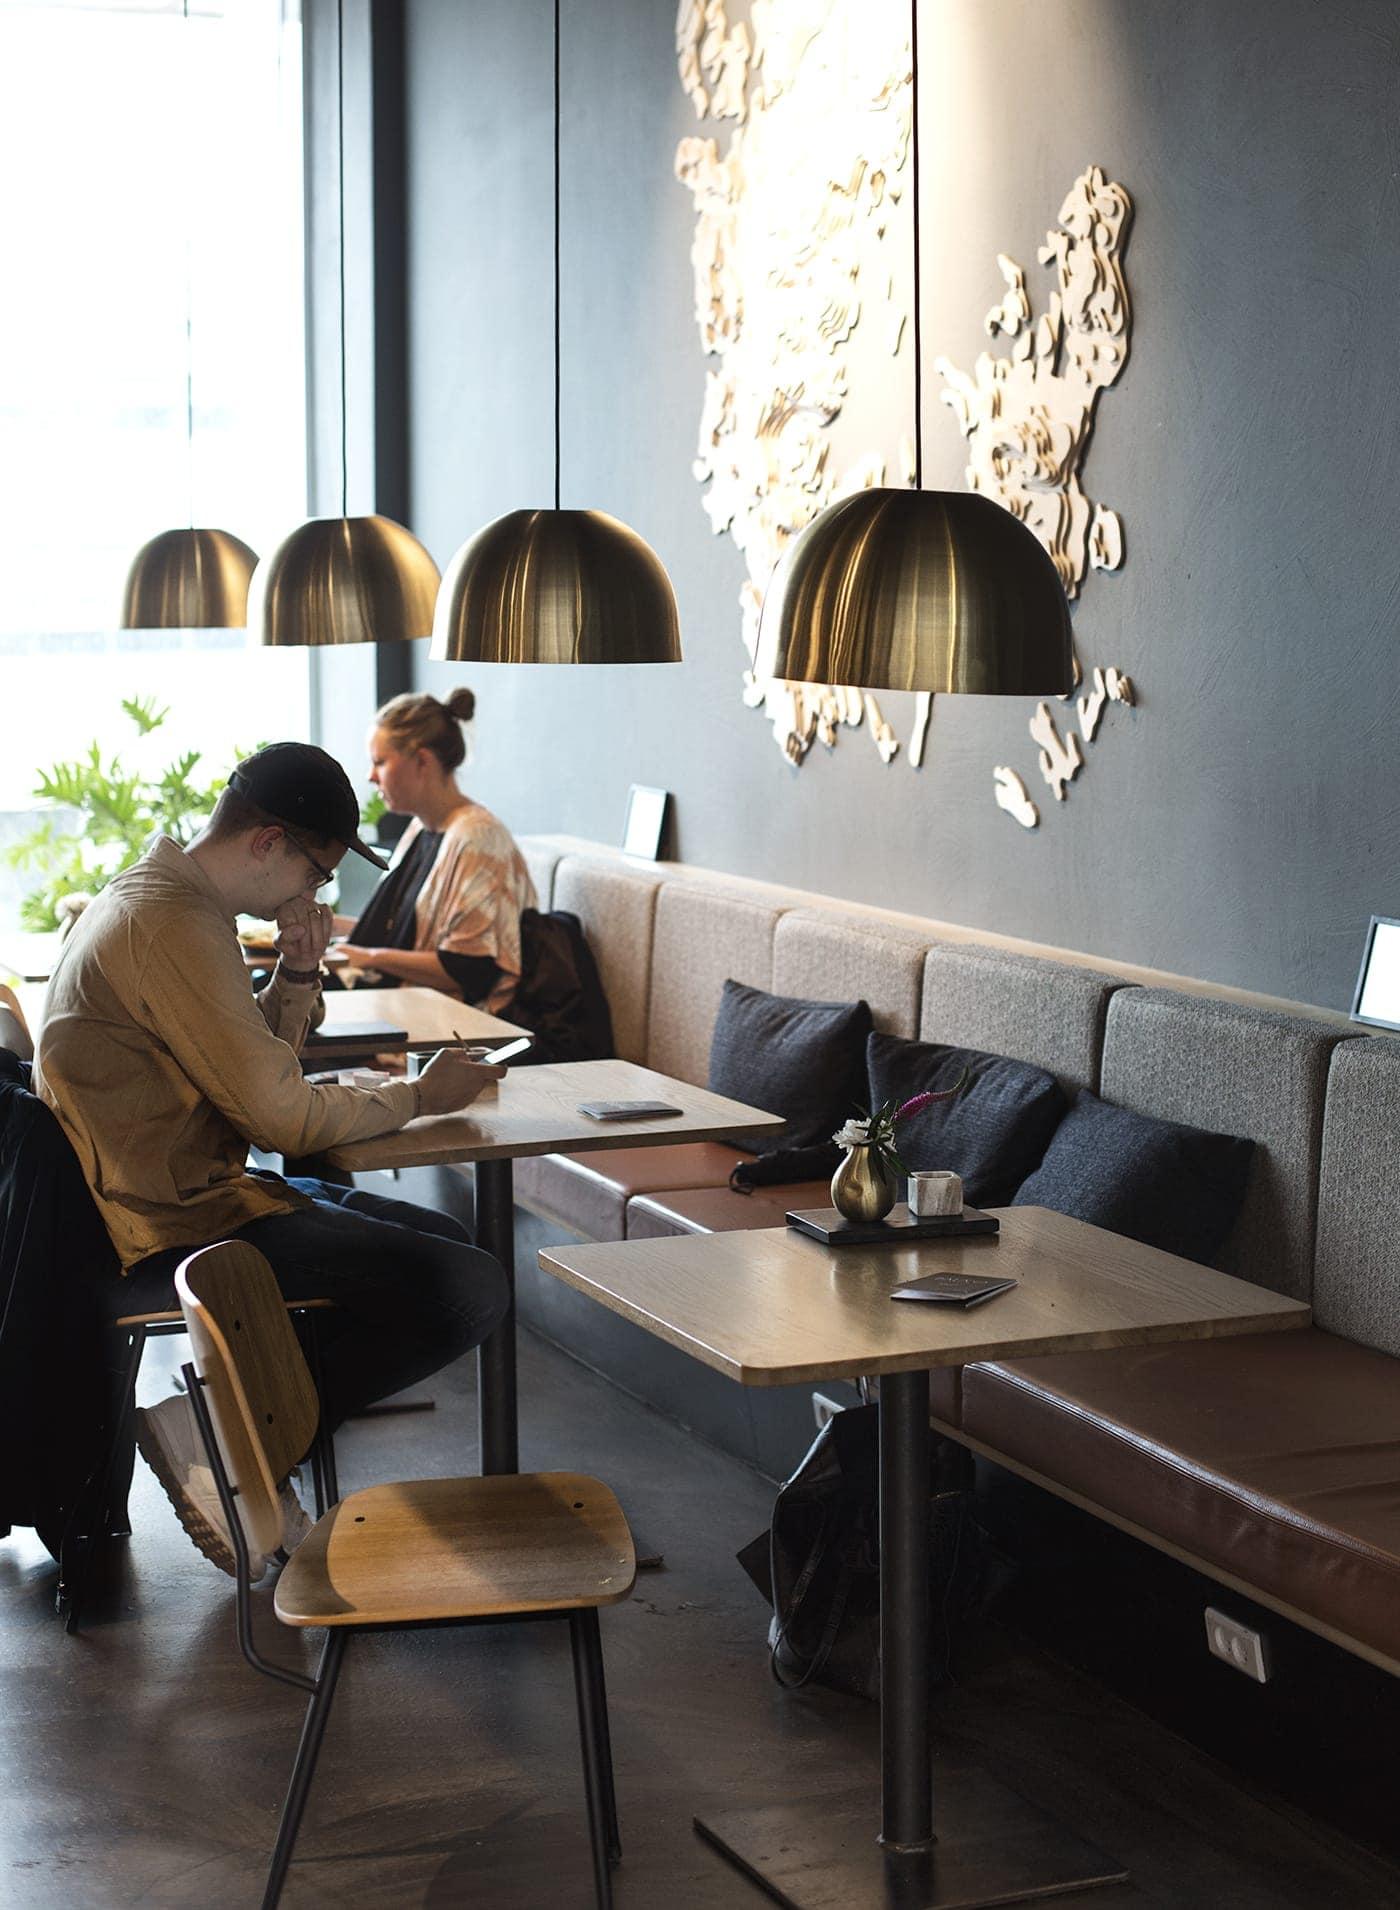 Copenhagen | wanderlust | paleo restaurant interior decor